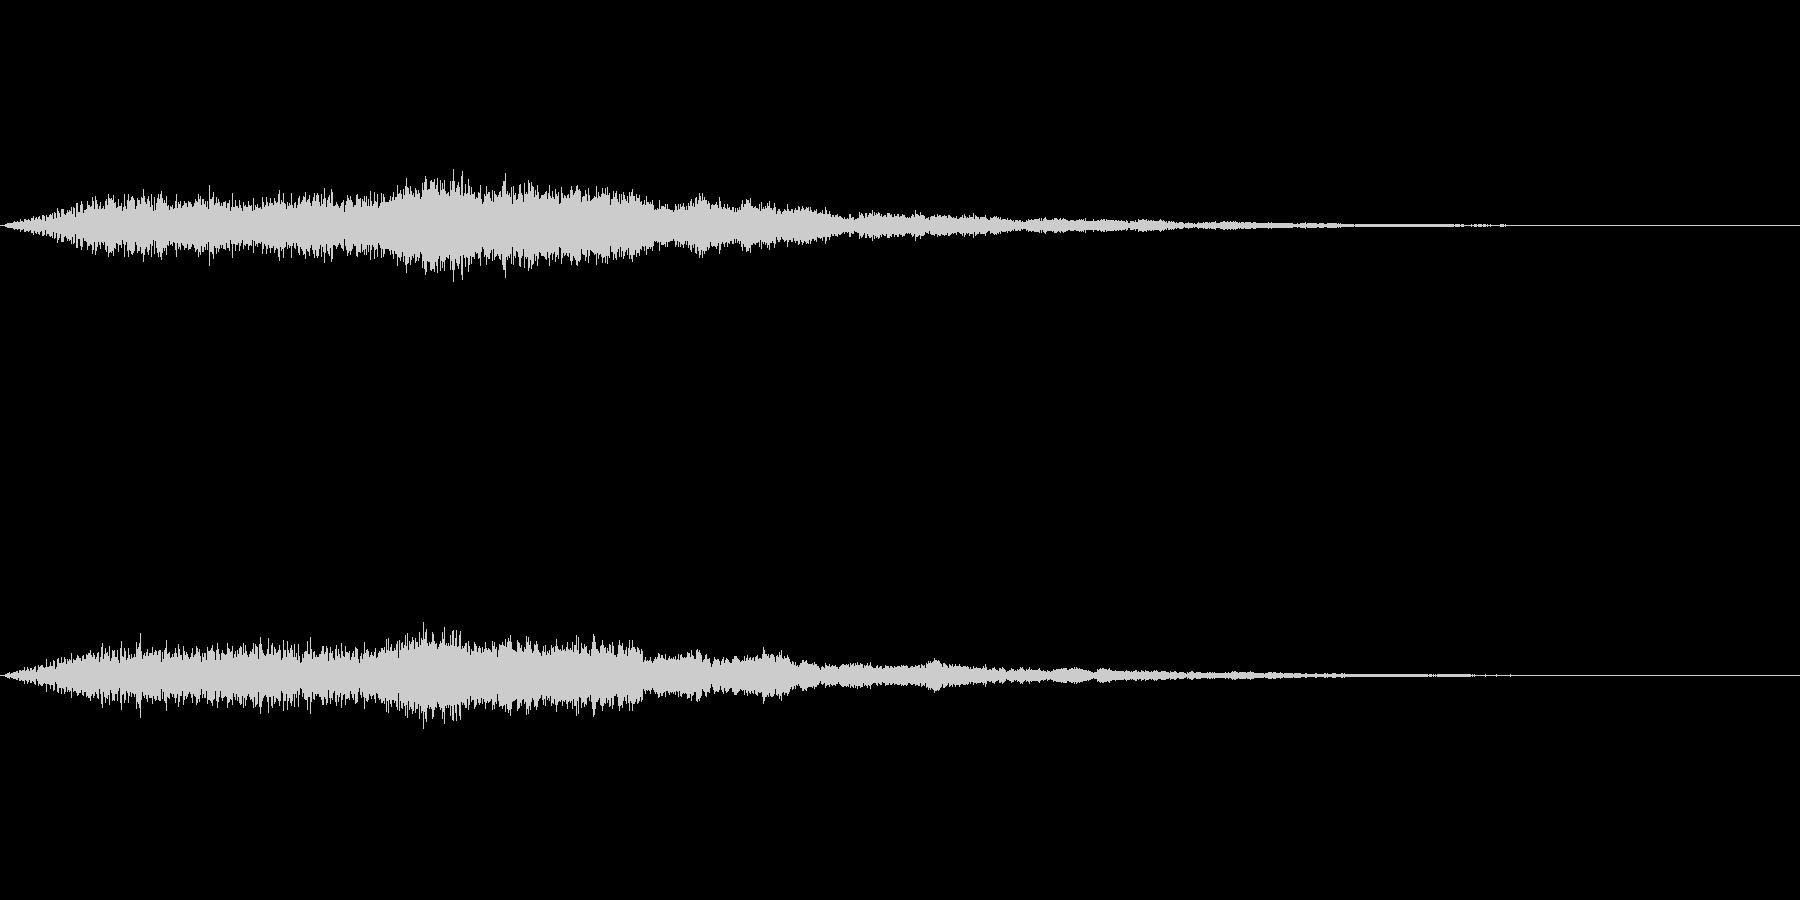 【SE 効果音】奇妙な音2の未再生の波形